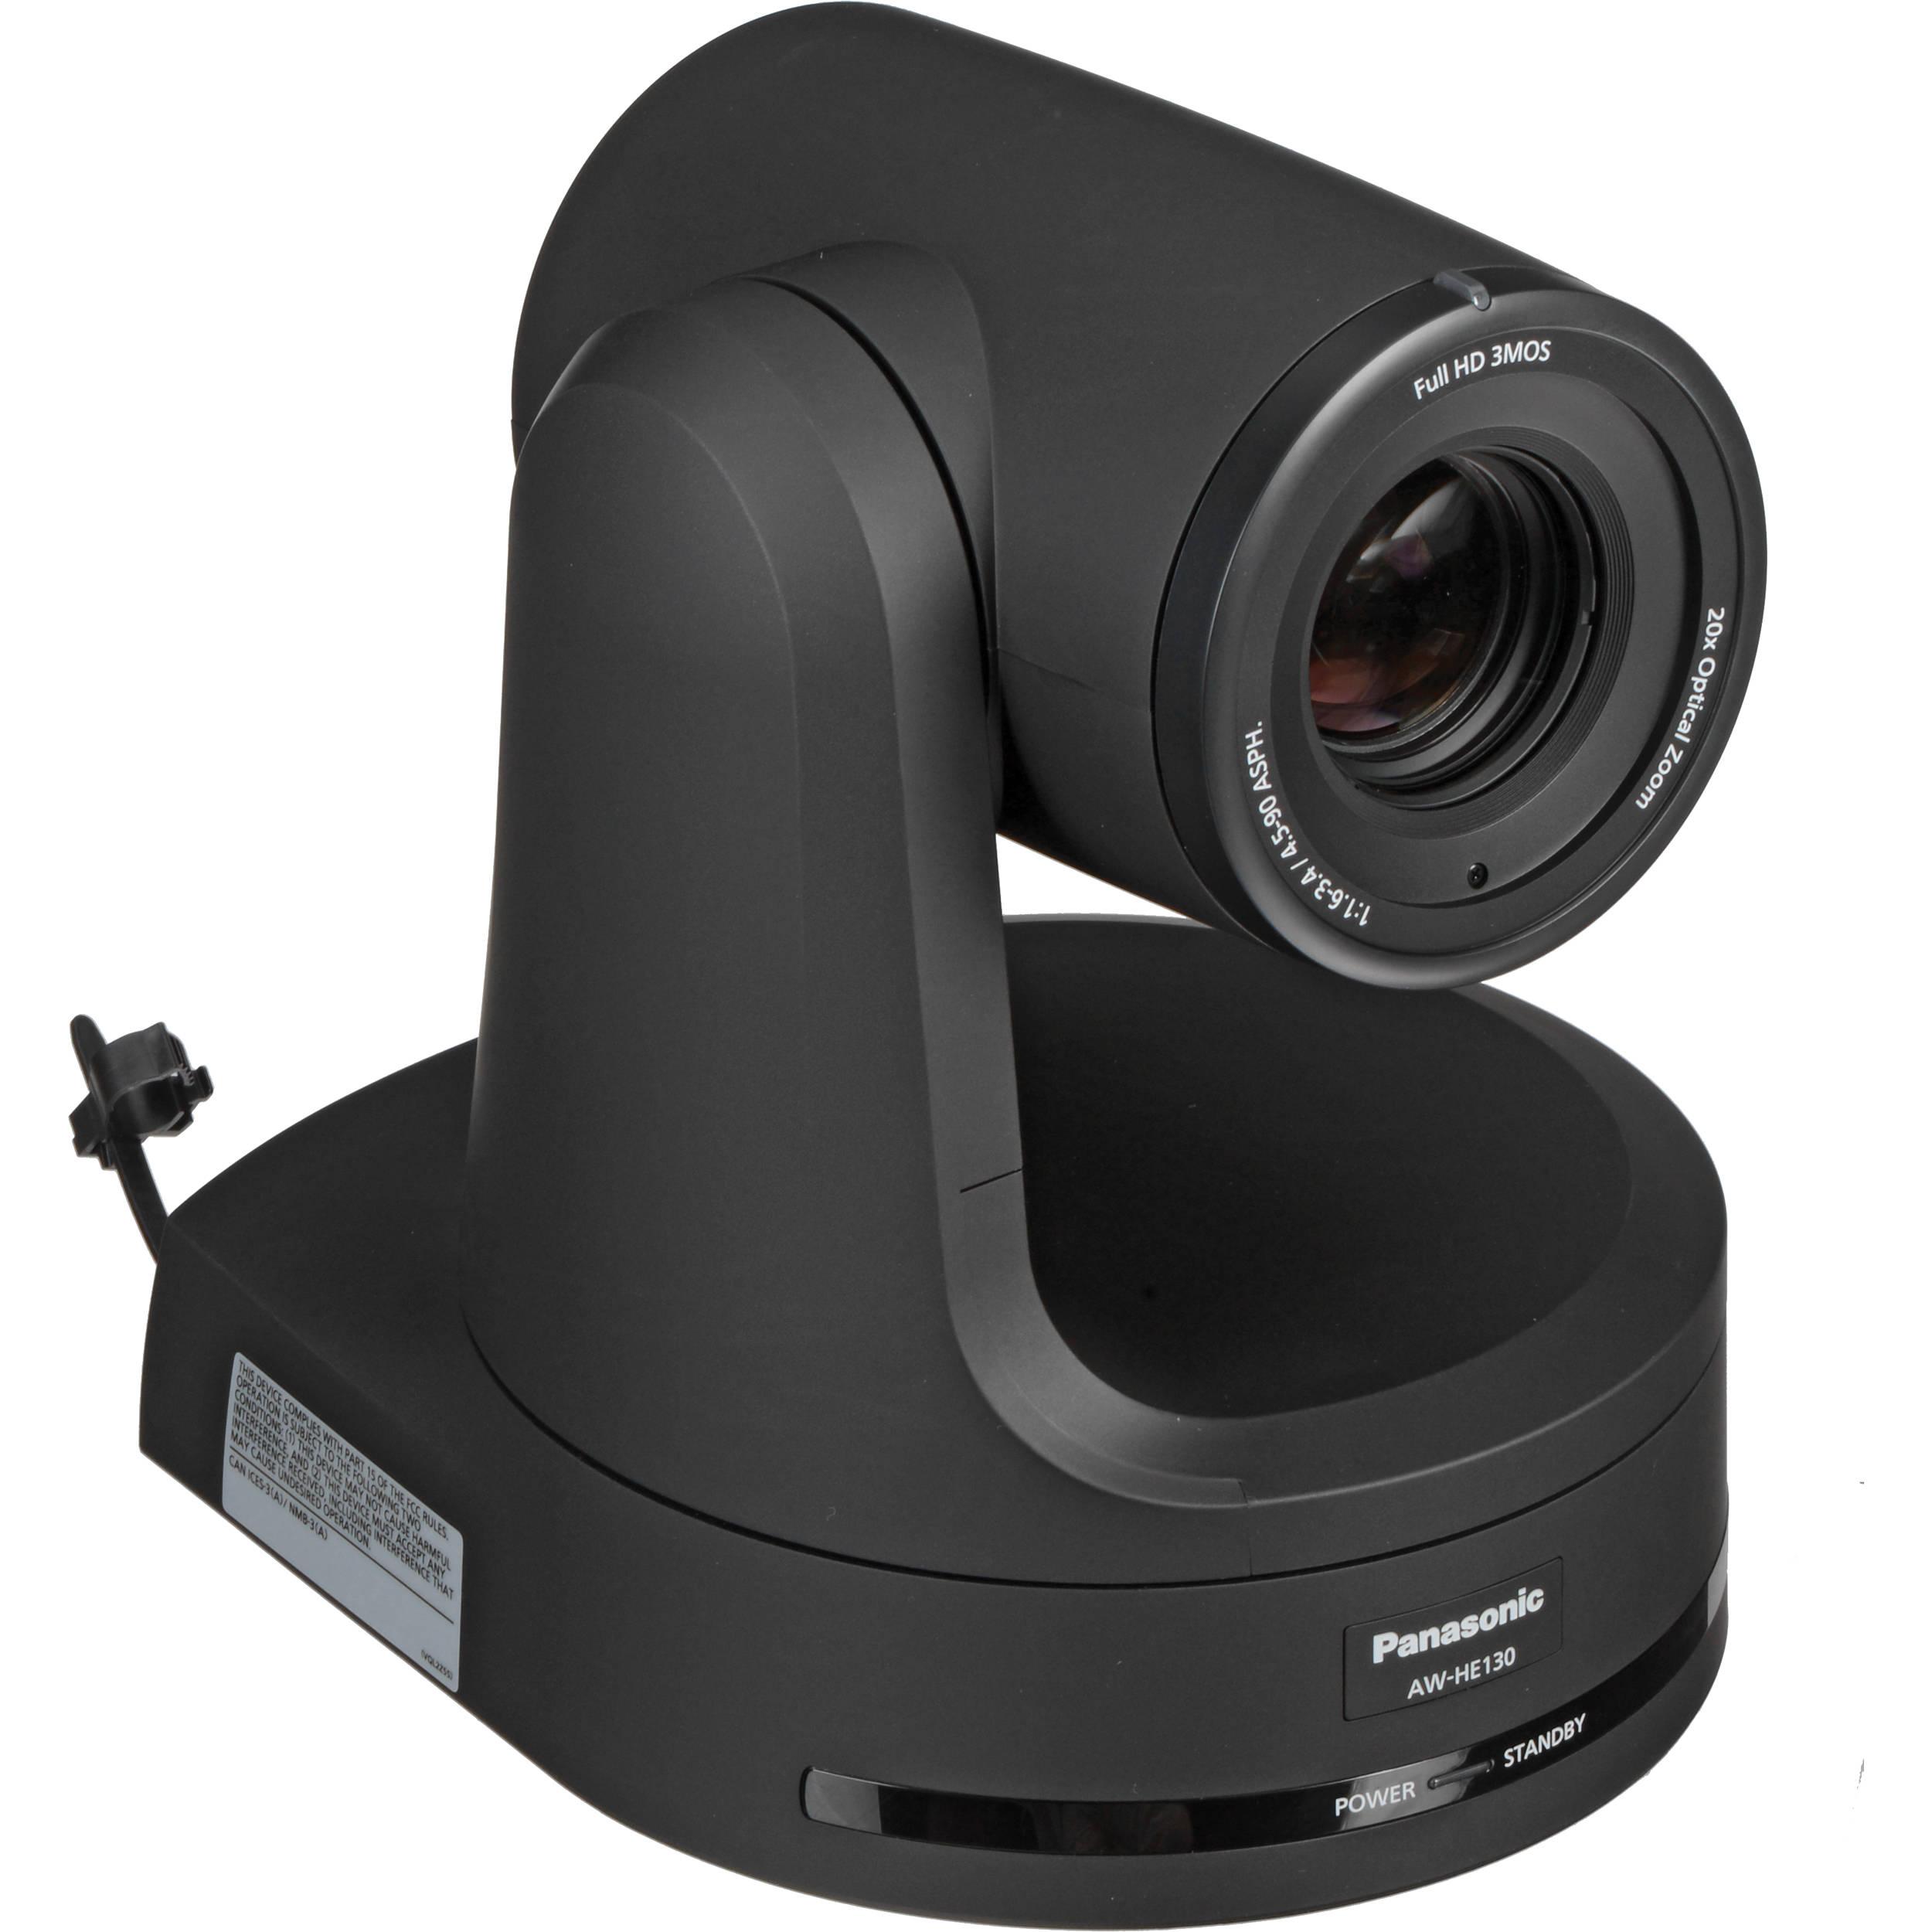 Panasonic AW-HE130 HD Integrated Camera (Black) AW-HE130KPJ B&H